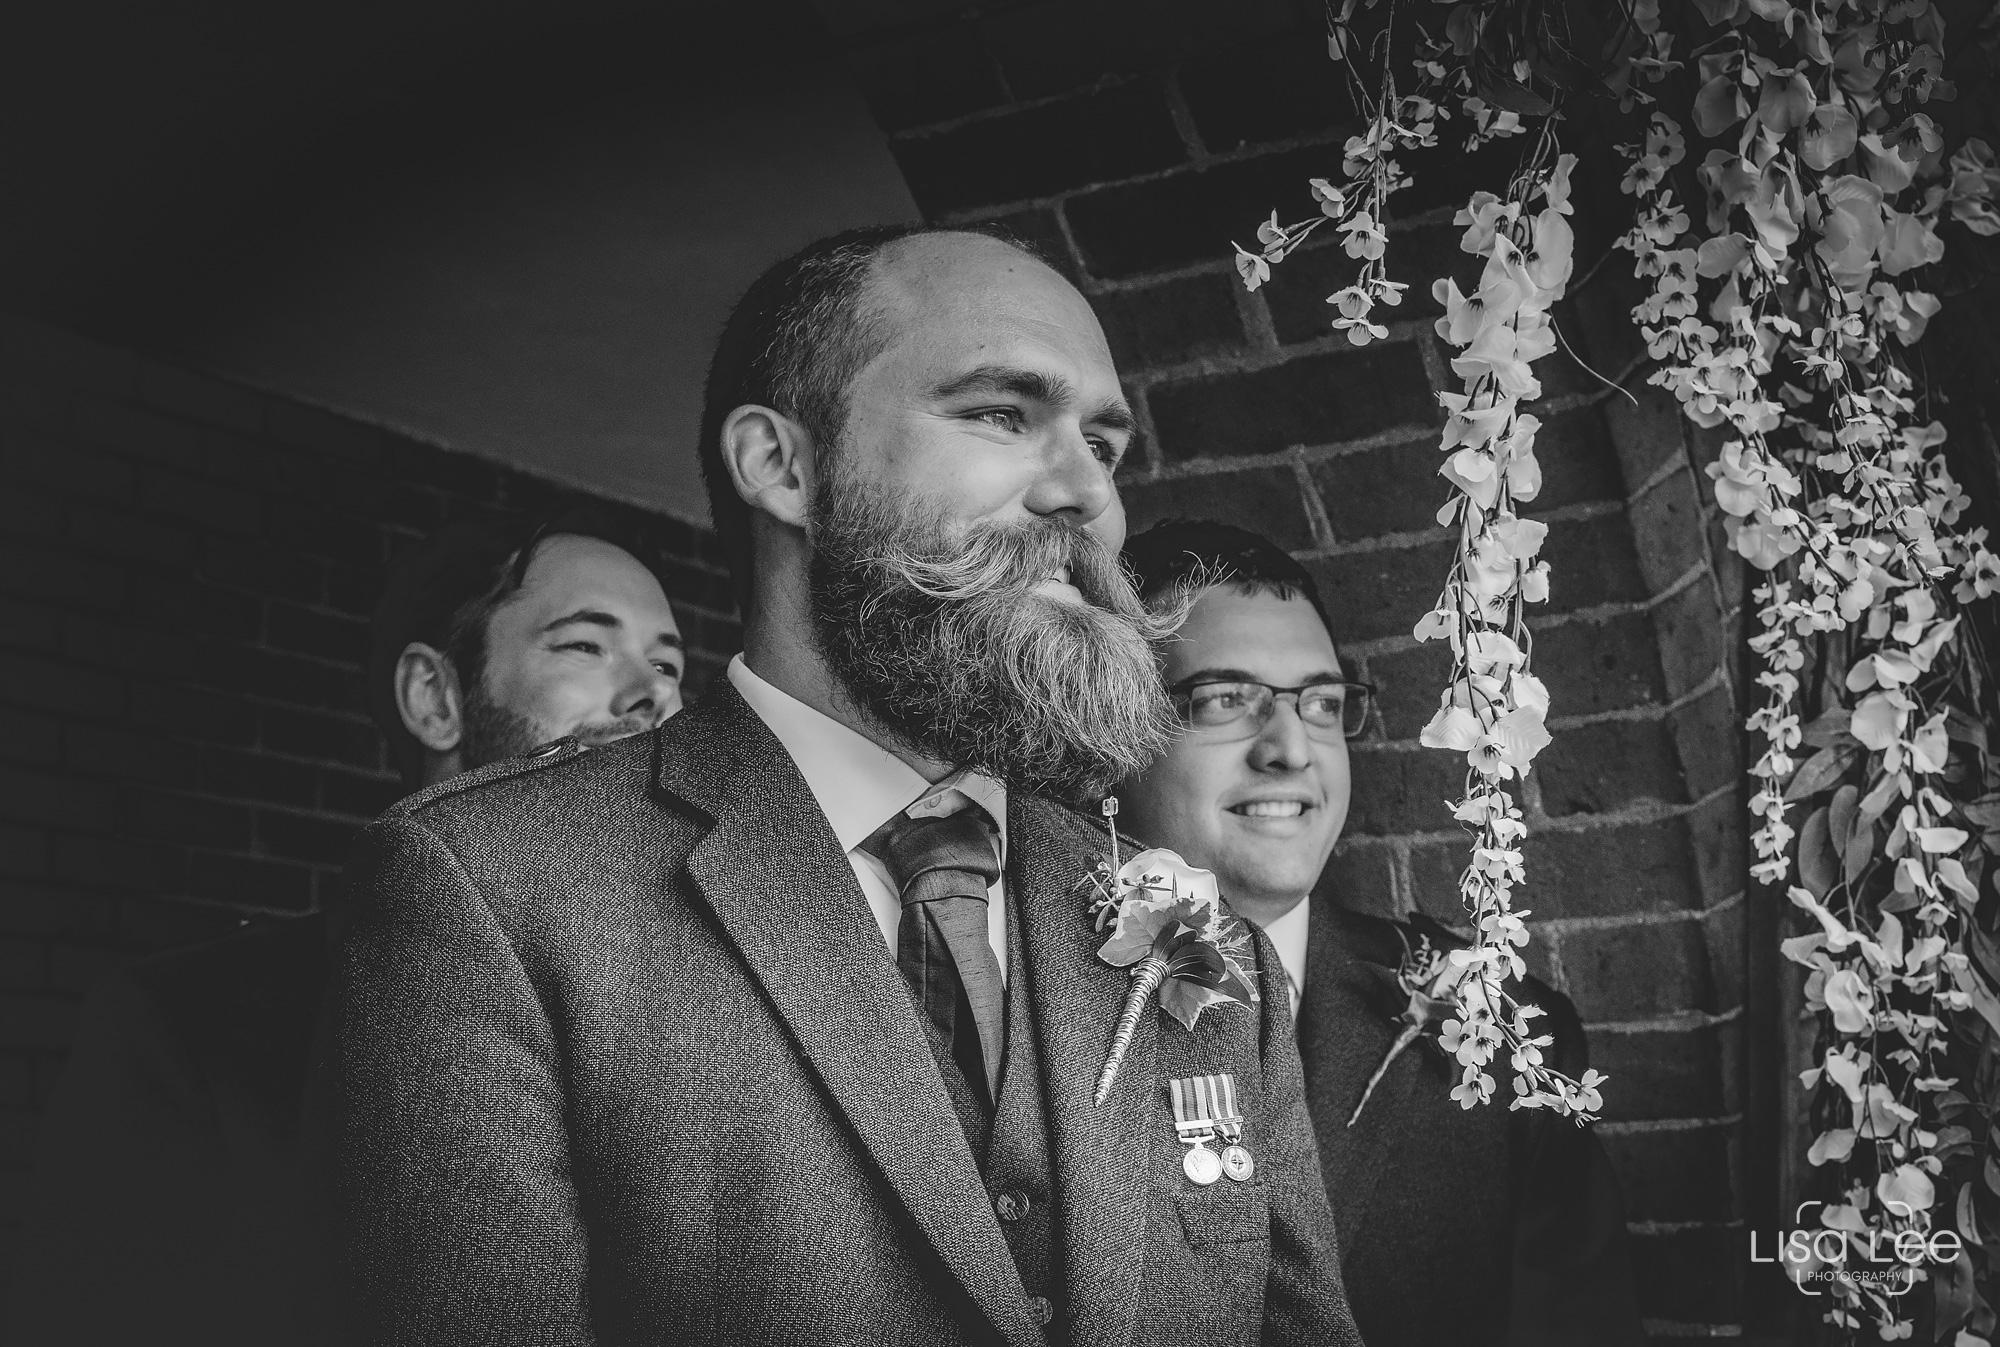 lisa-lee-wedding-photography-ceremony-talbot-heath-10.jpg